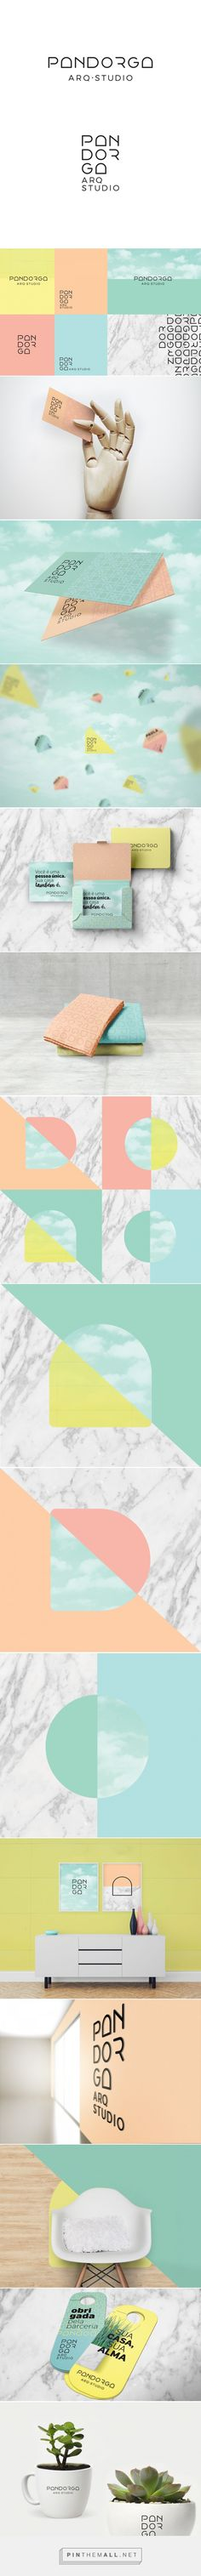 Pandorga Branding on Behance | Fivestar Branding – Design and Branding Agency & Inspiration Gallery